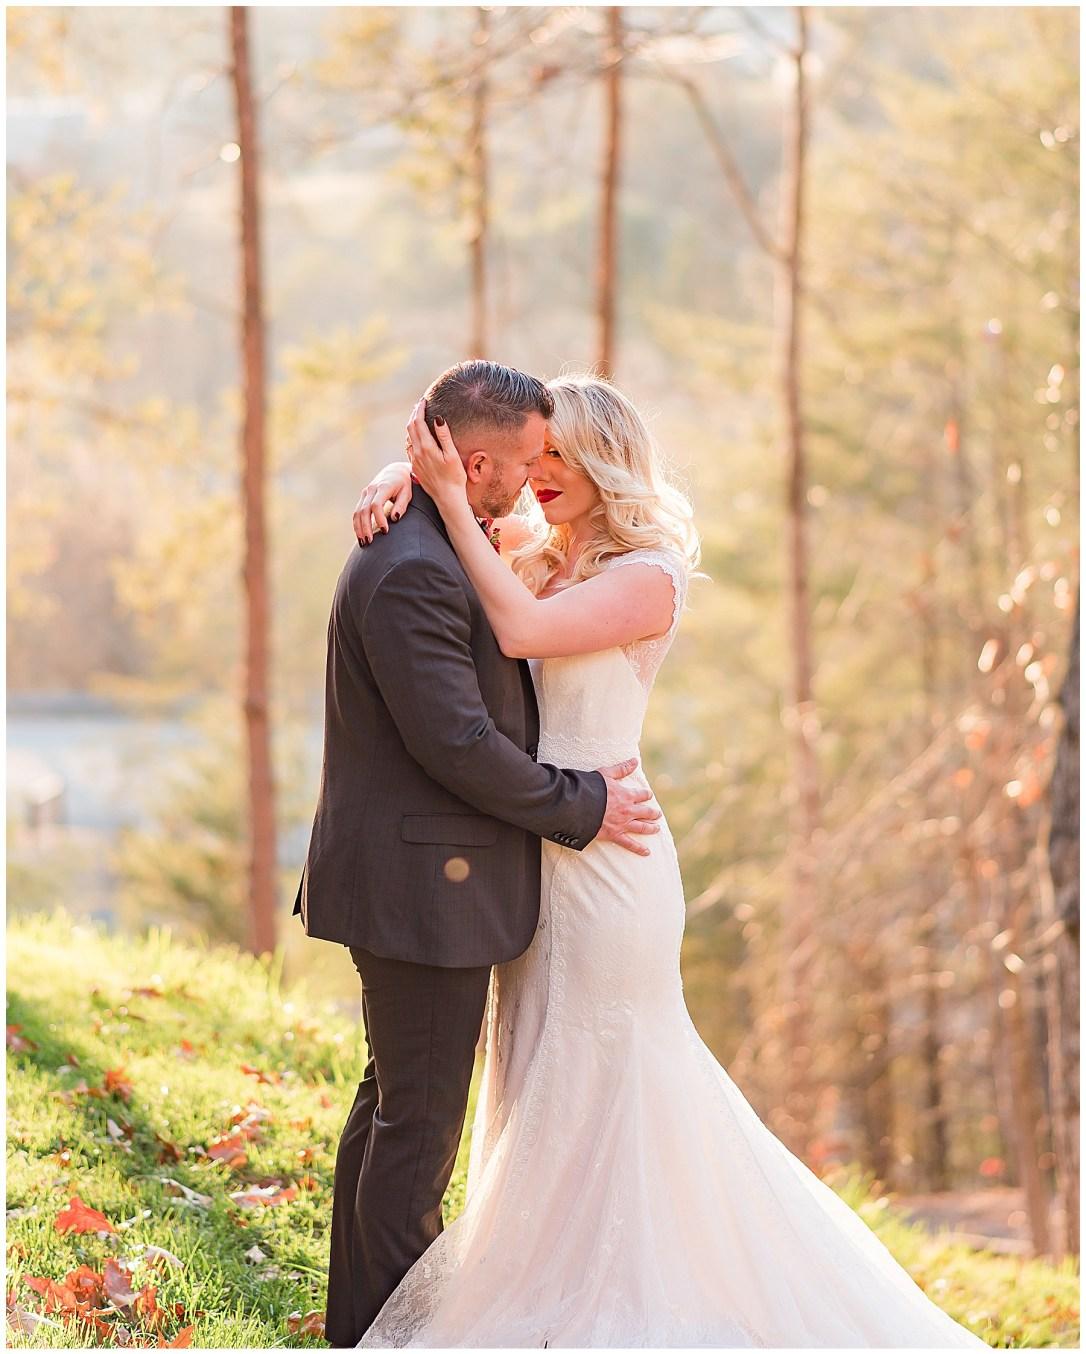 Gardens in the Gorge Romantic Wedding Photos